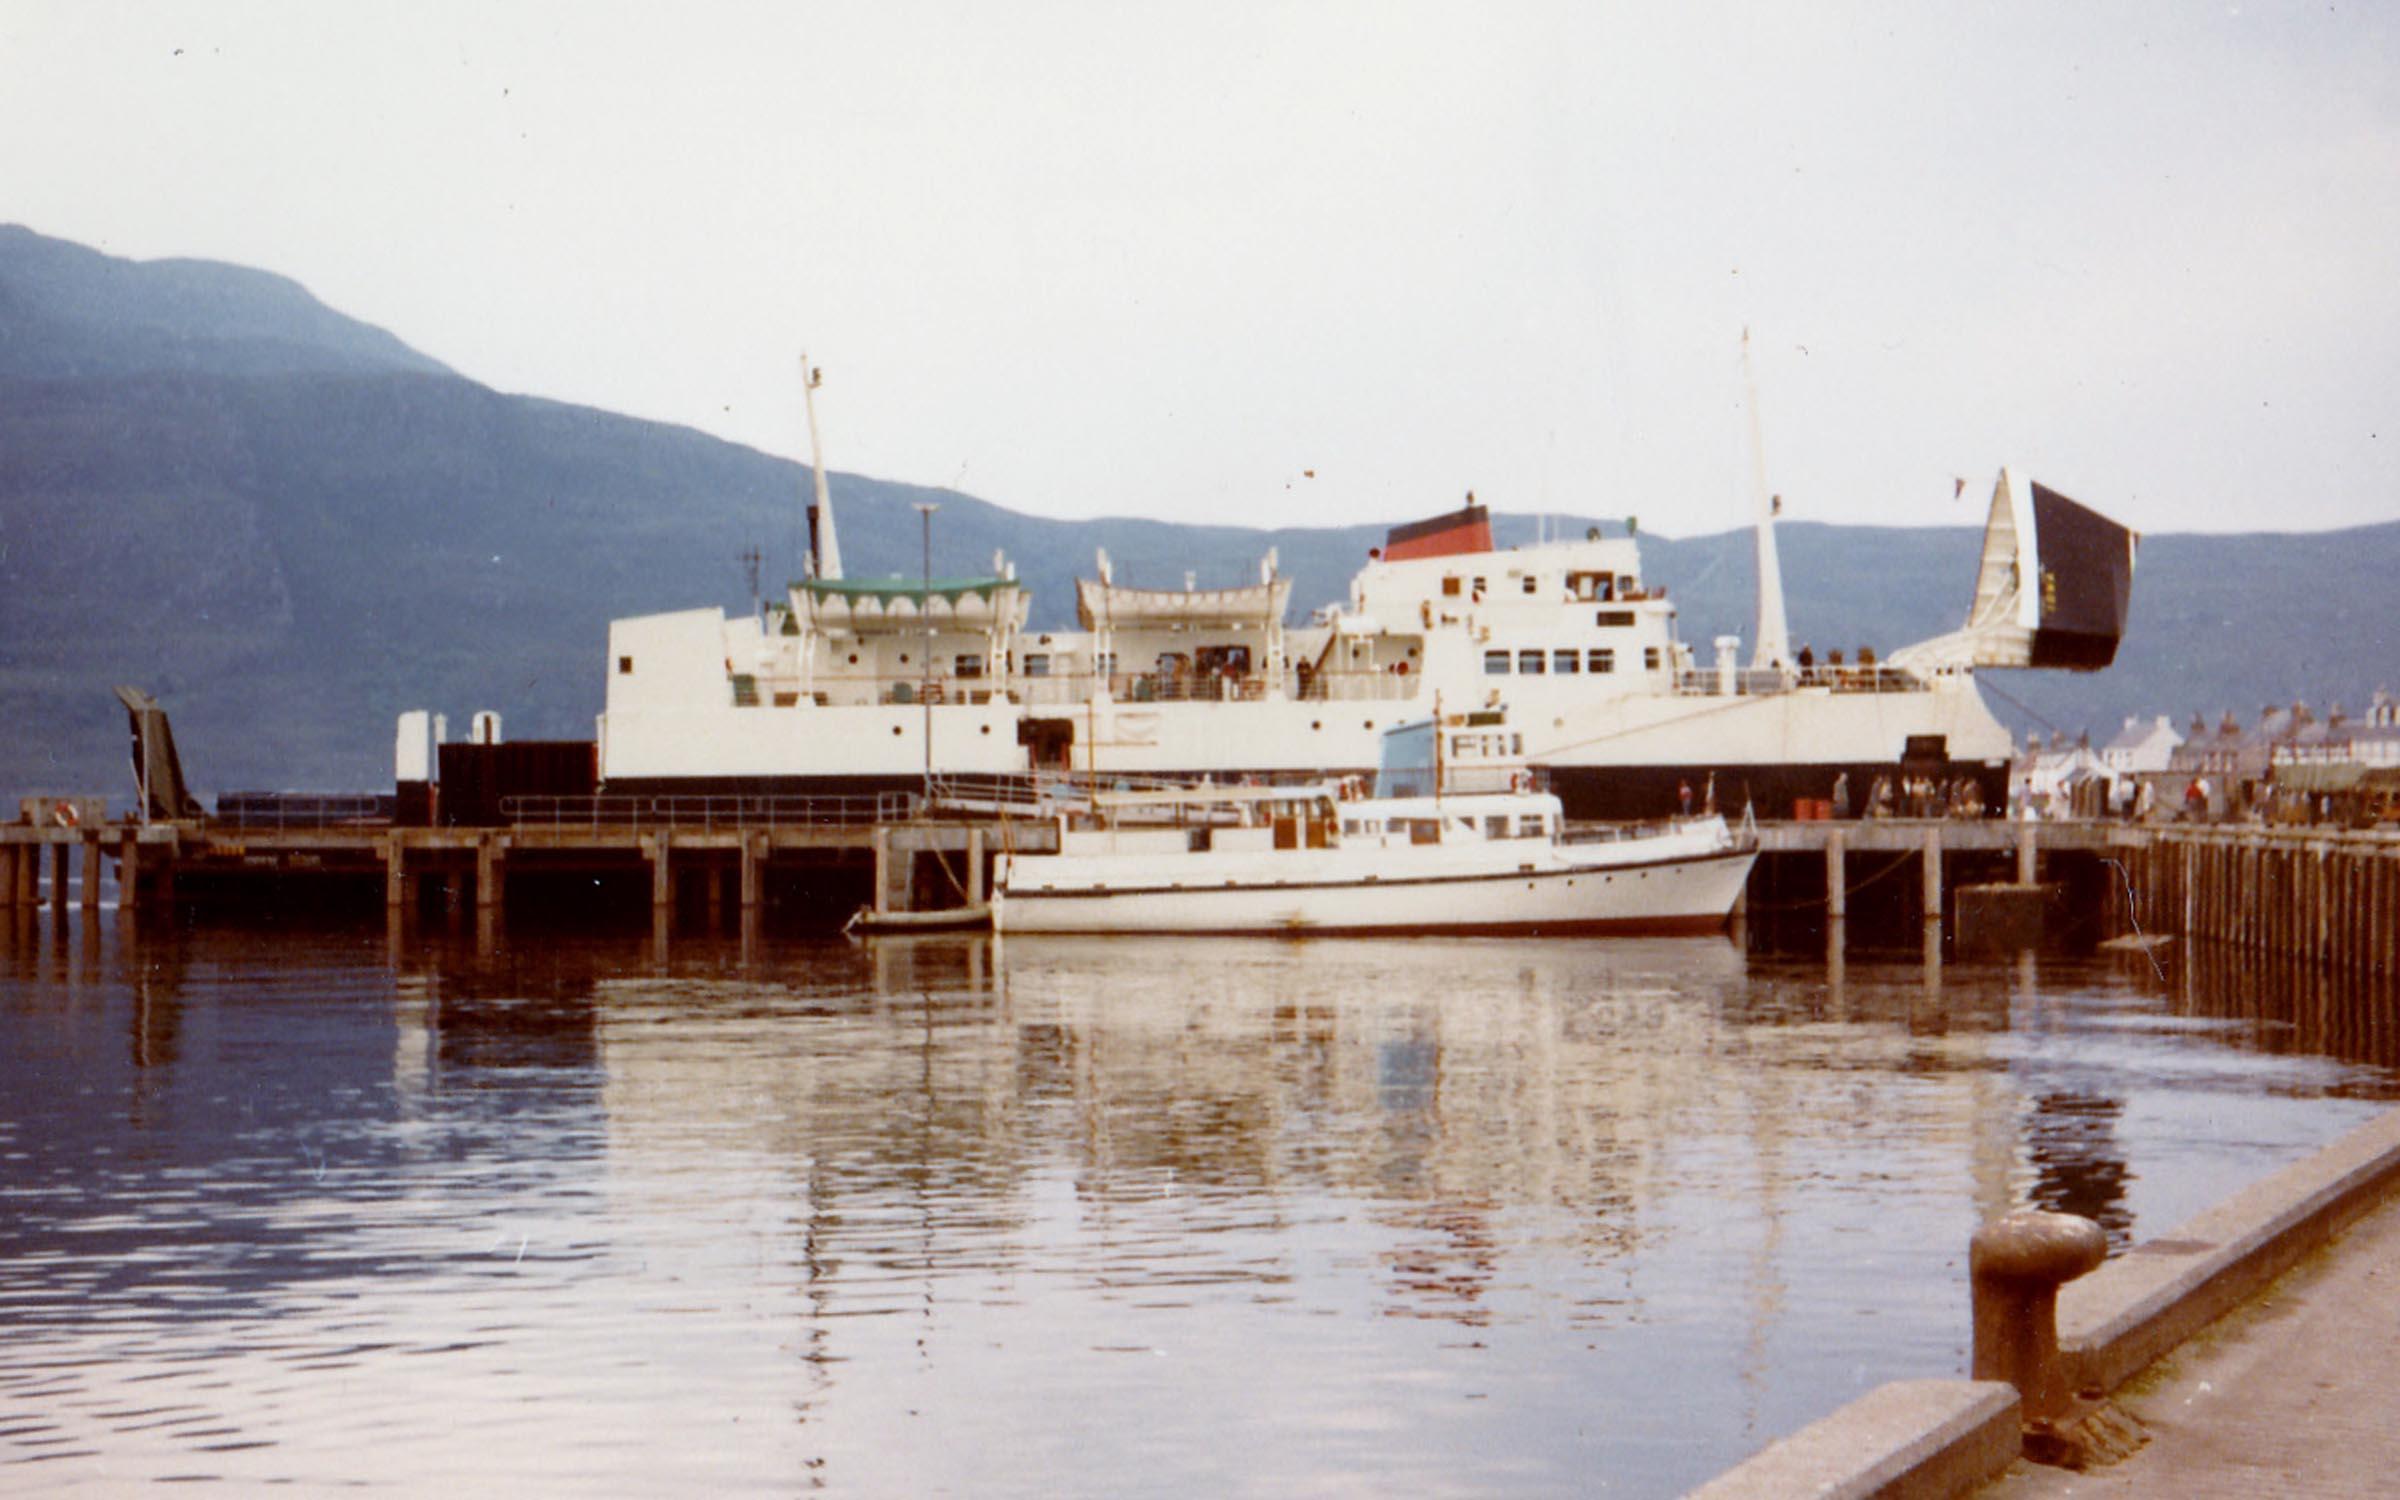 Iona loading at Ullapool (Jim AIkman Smith)